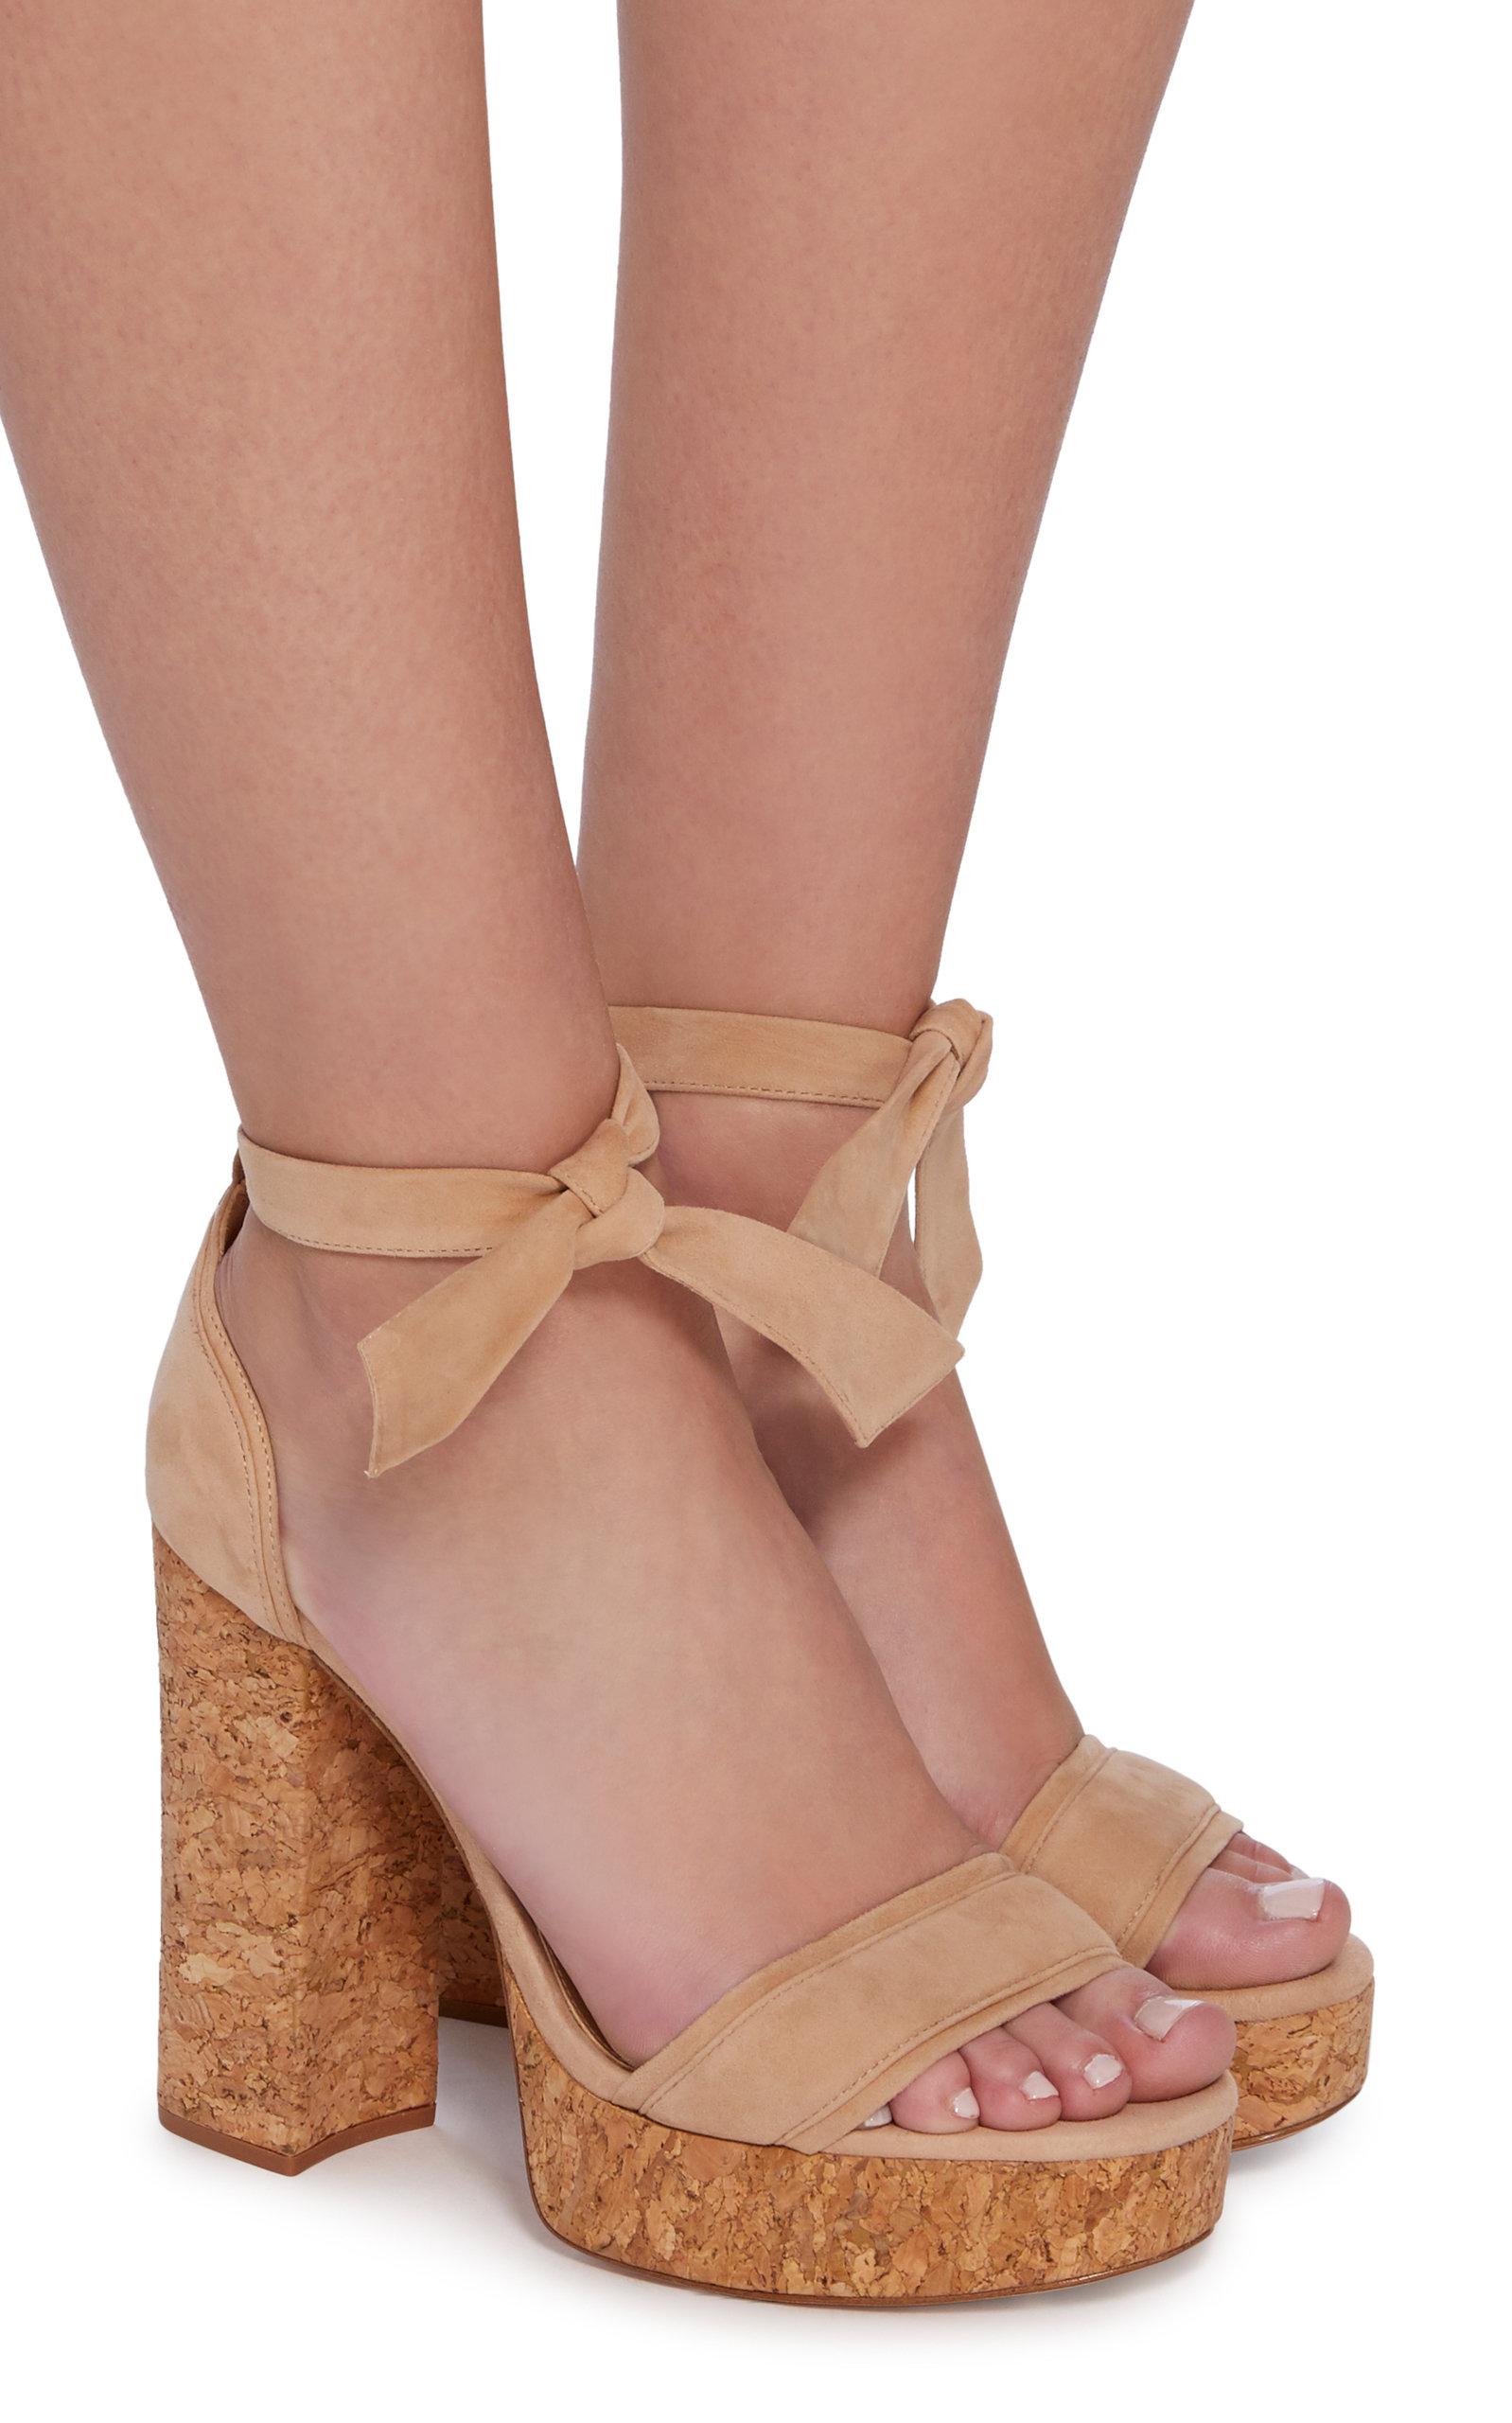 ALEXANDRE BIRMAN Celine Suede Platform Sandals picJV60R